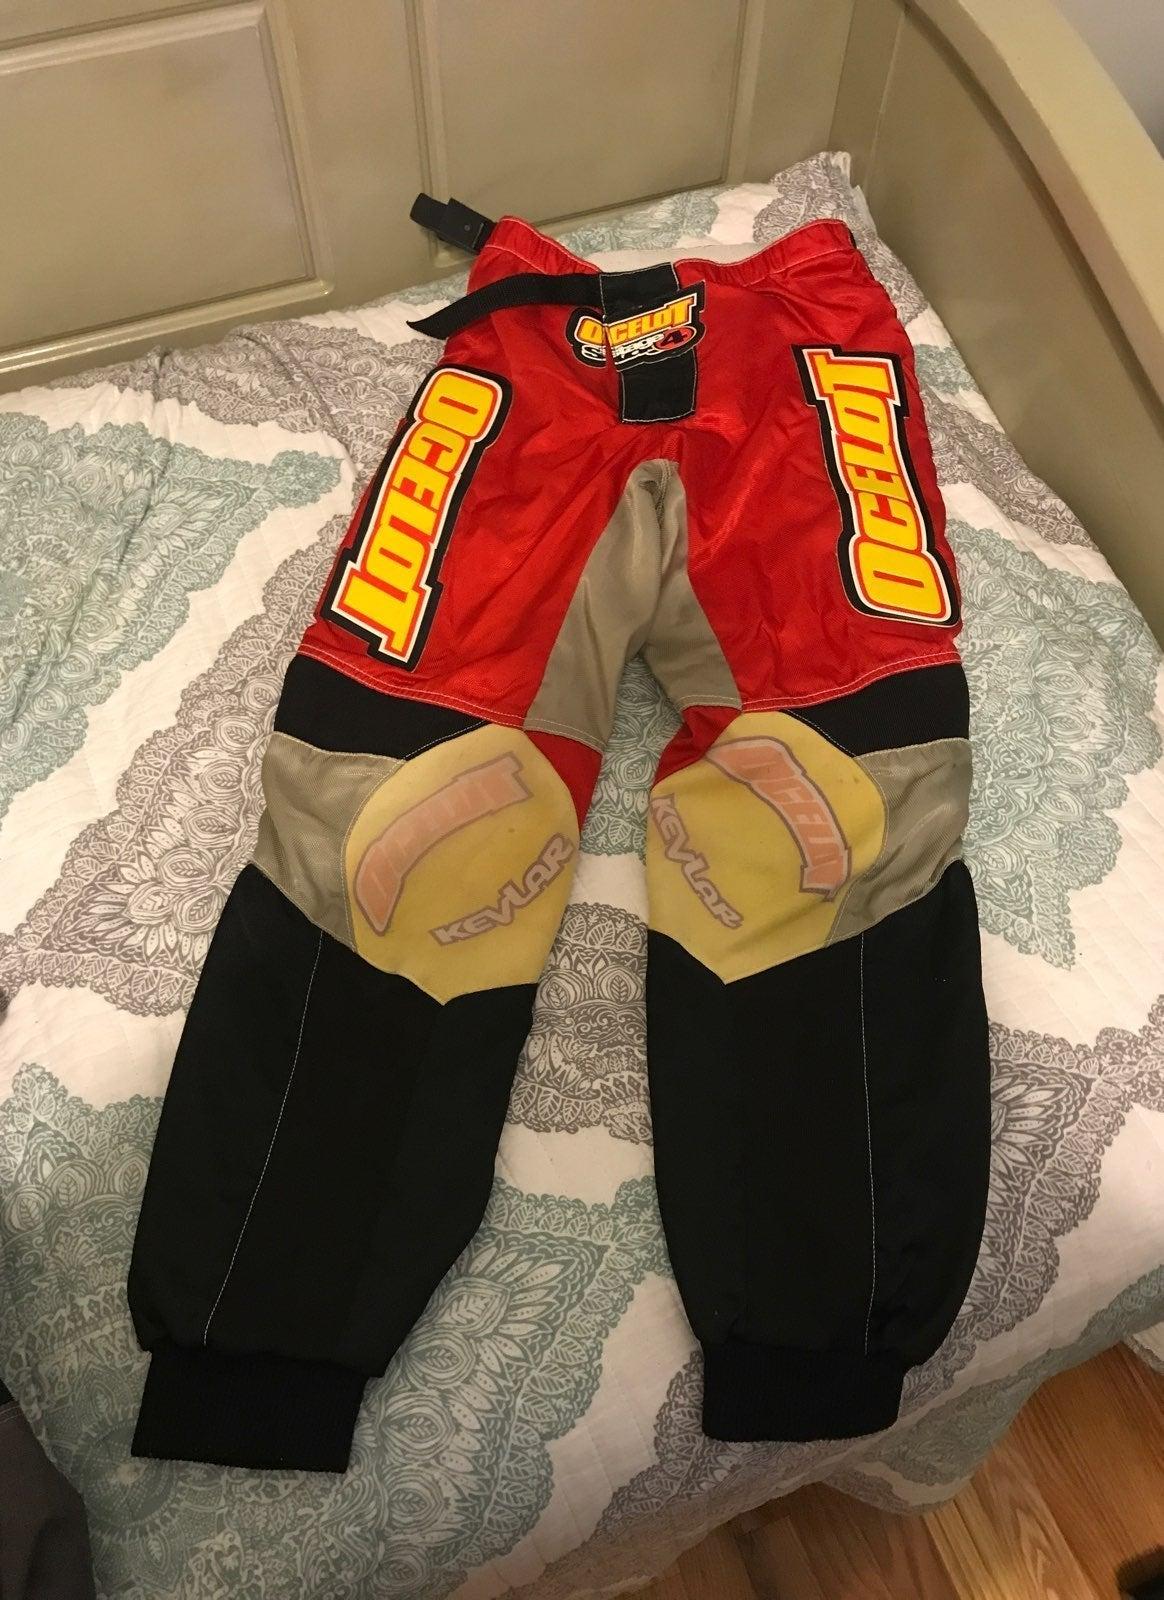 Ocelot Motorcycle Pants Size 28